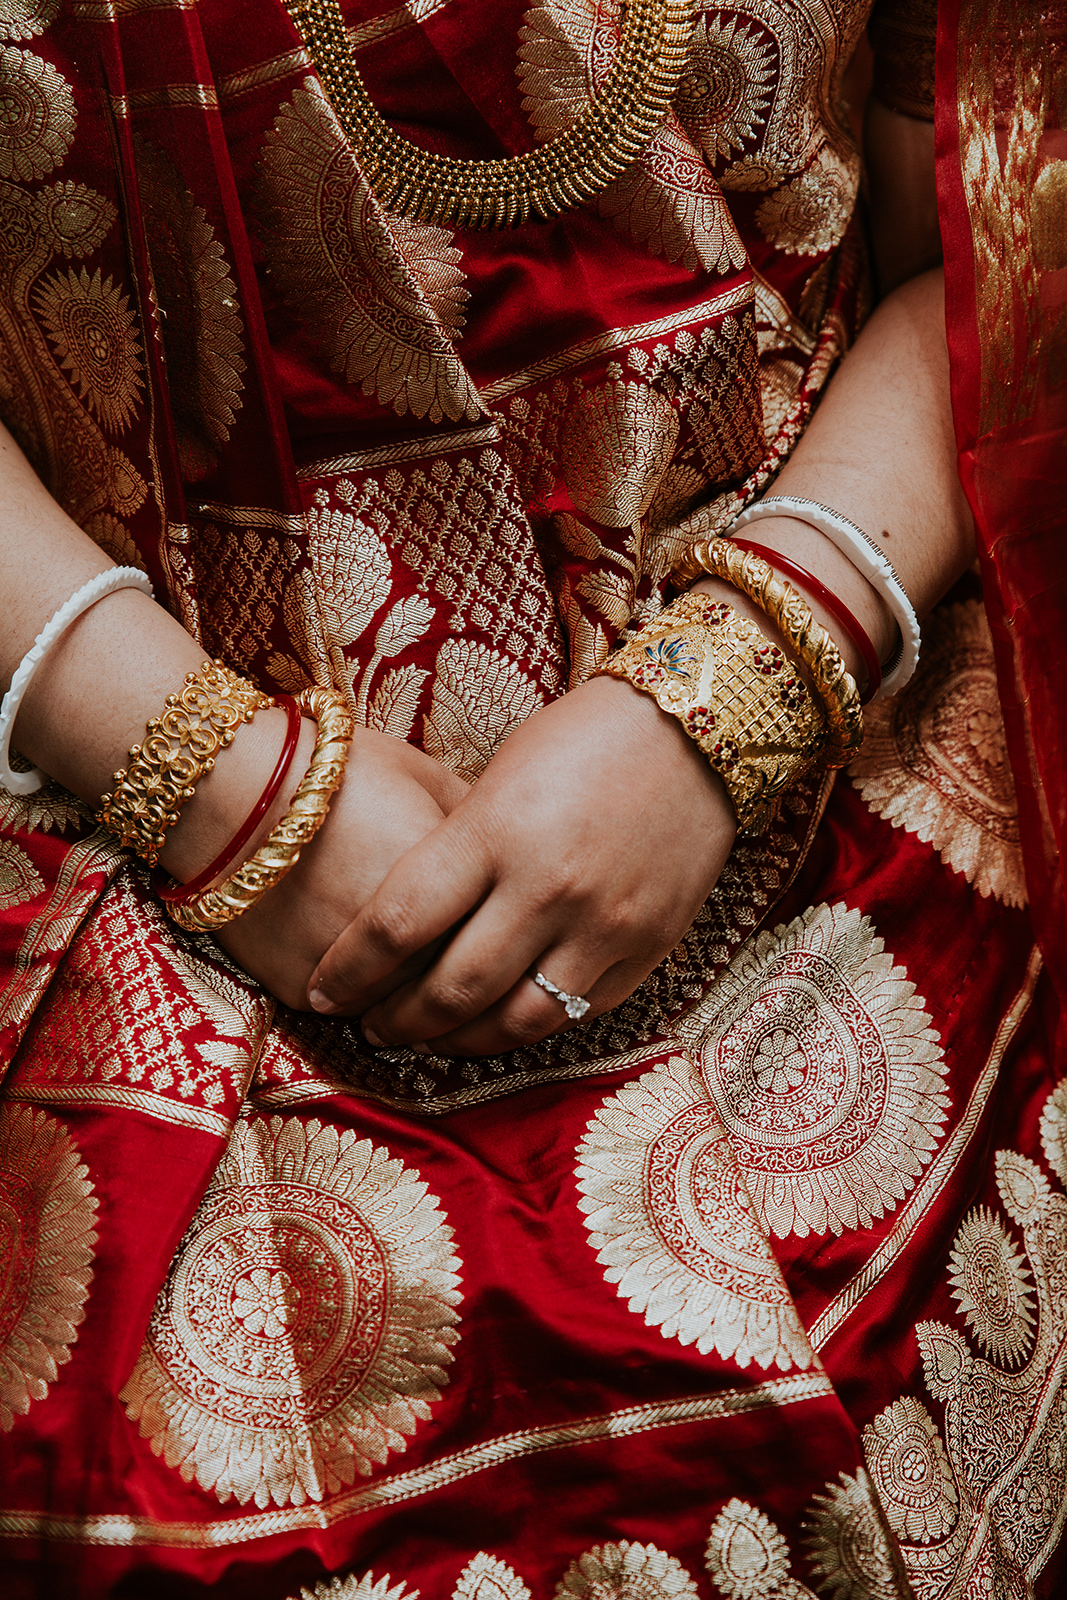 Le Cape Weddings - South Asian Wedding - Ishani and Sidhart - Bride-5.jpg